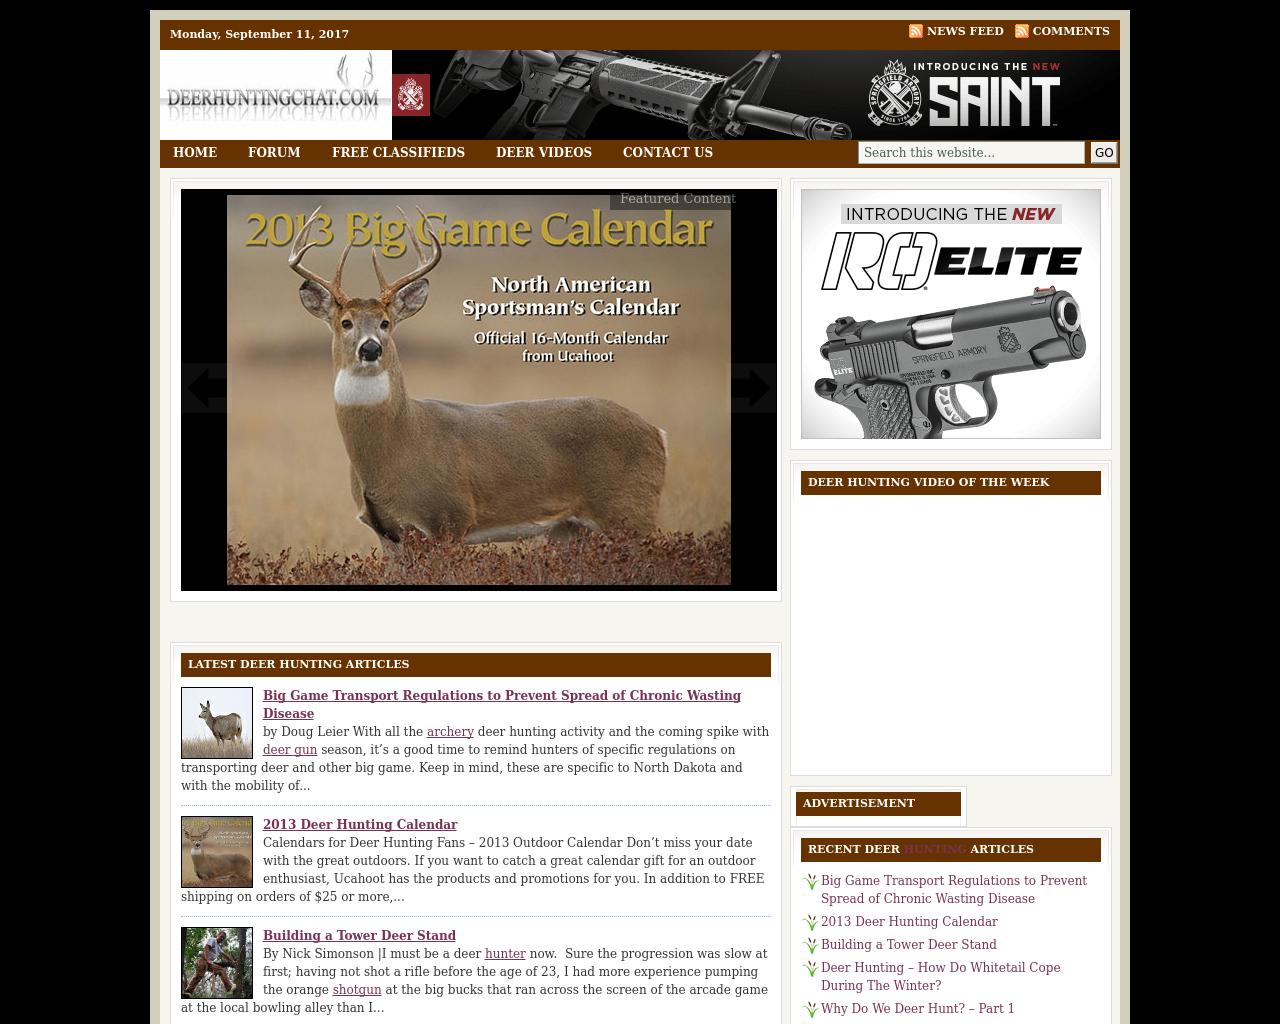 Deer-Hunting-Chat-Advertising-Reviews-Pricing